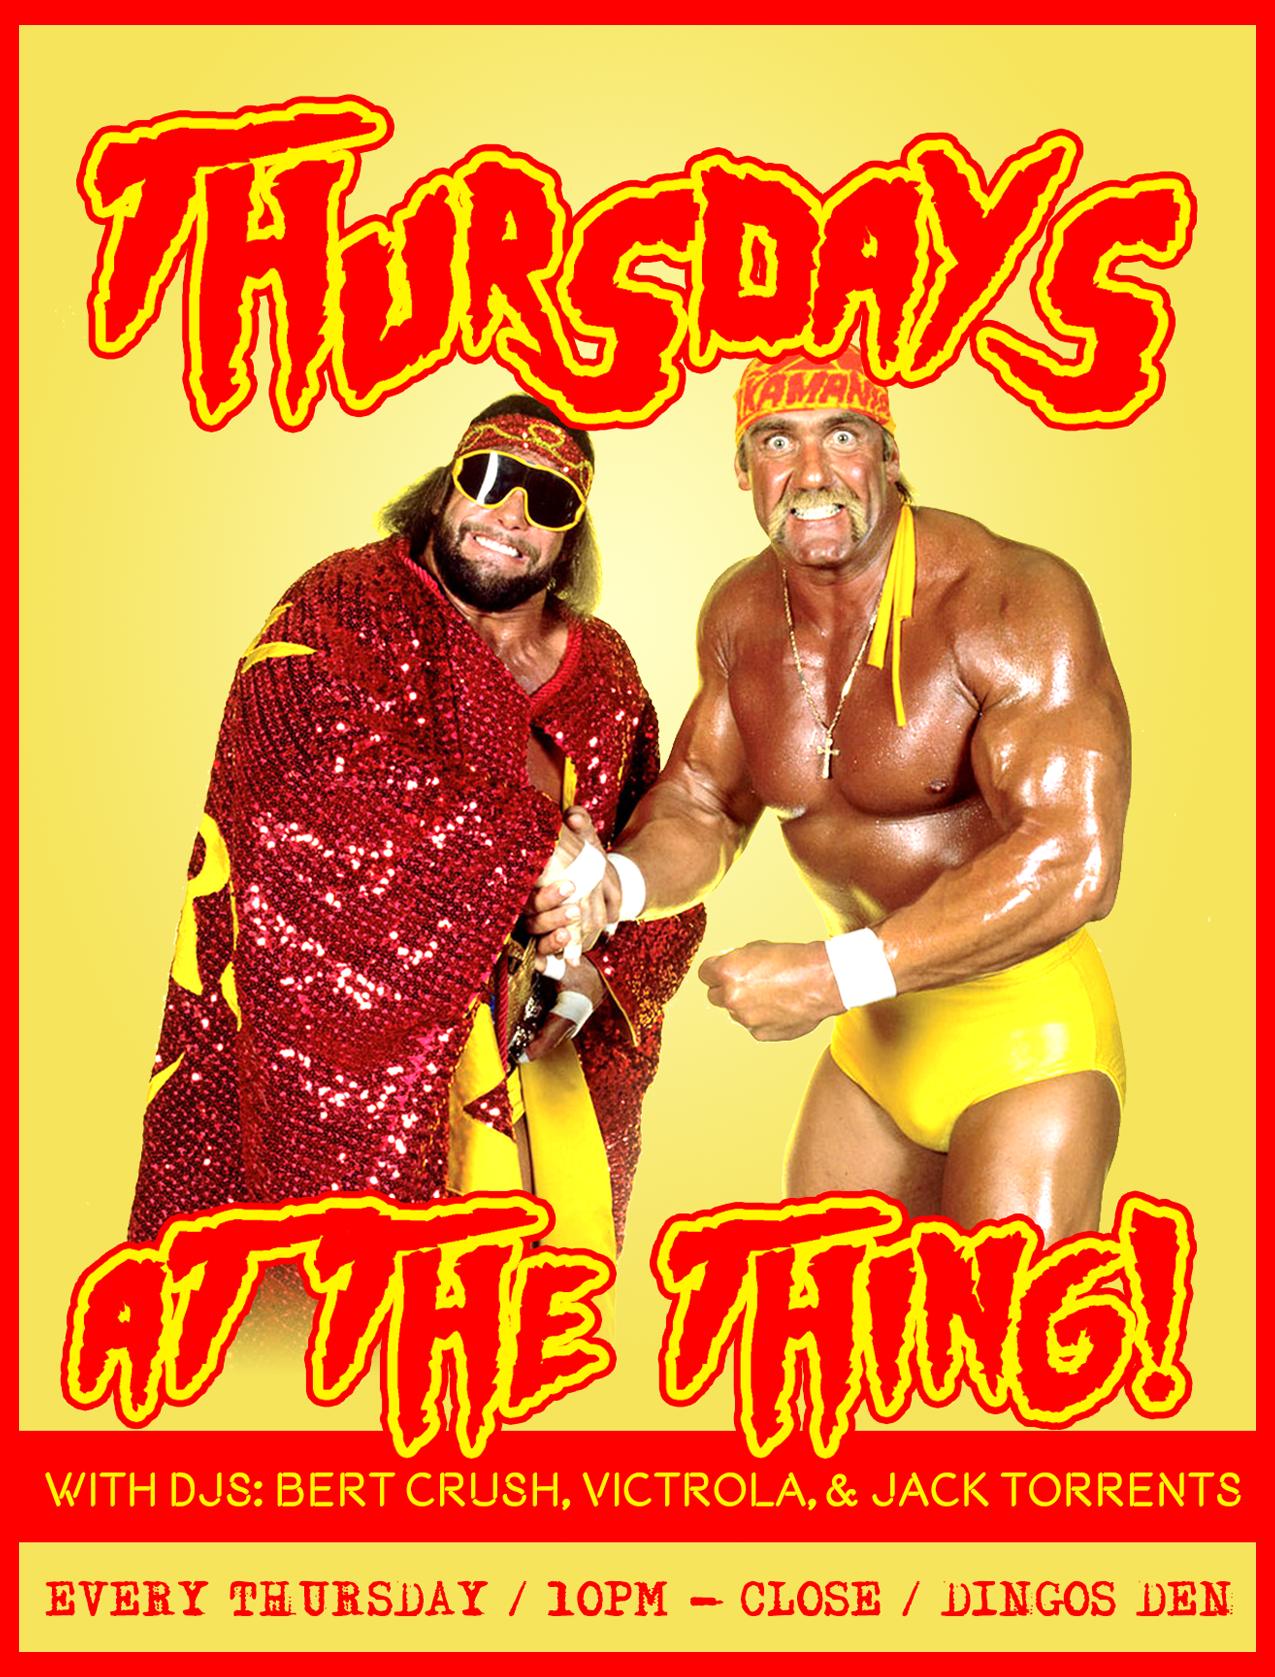 THURS_WWF.png